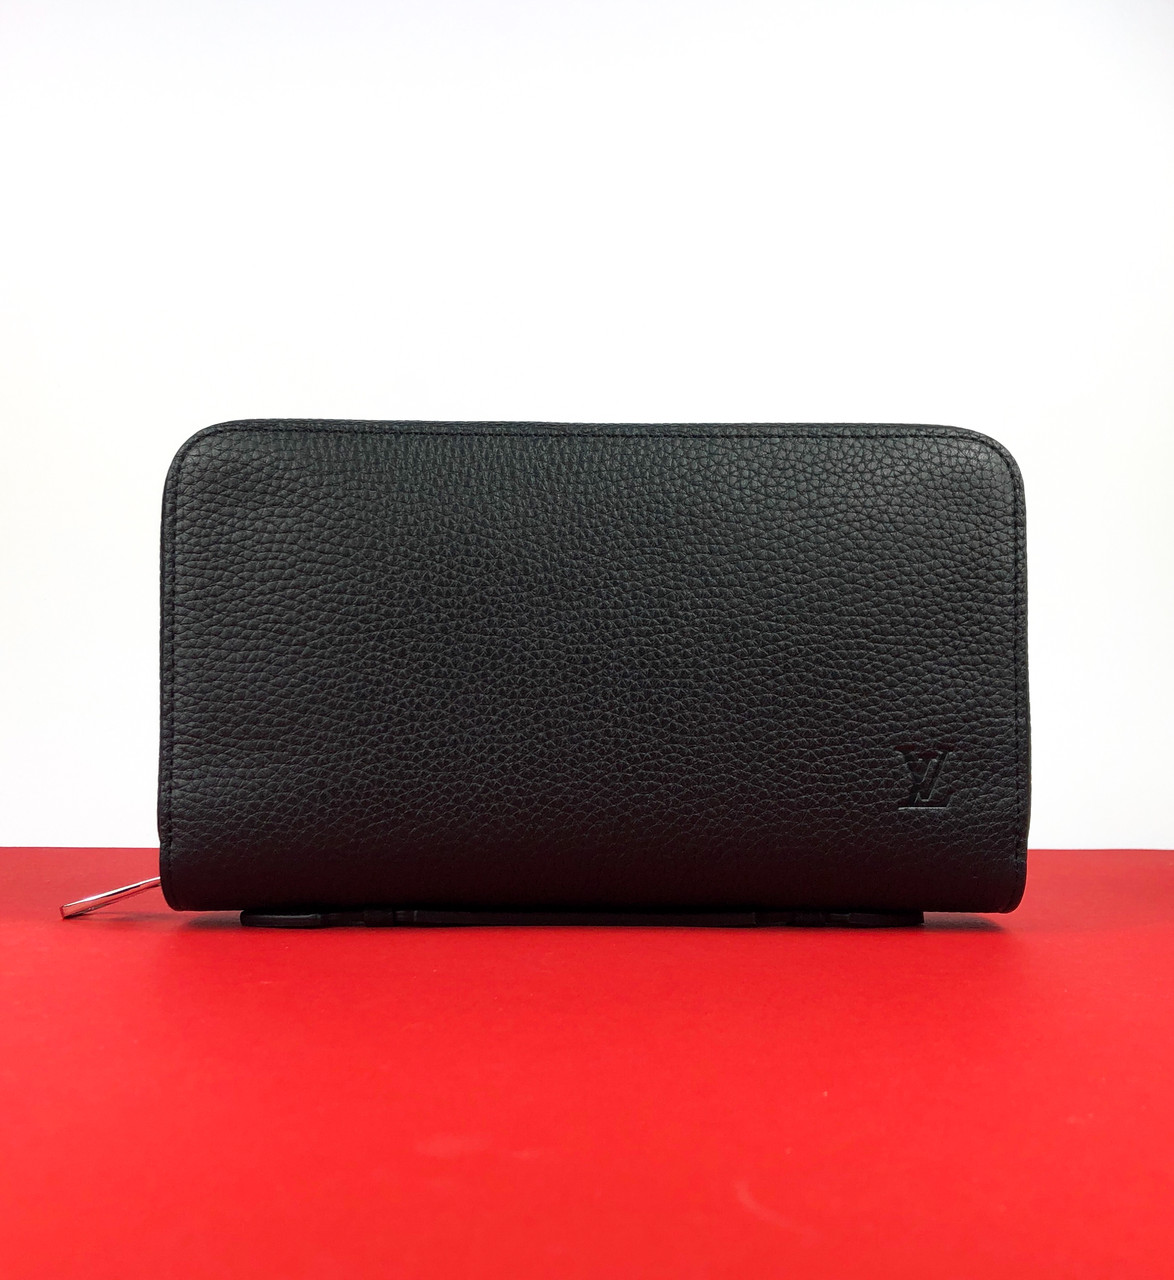 Бумажник мужской - Louis Vuitton XL (Луи Виттон) арт. 32-17